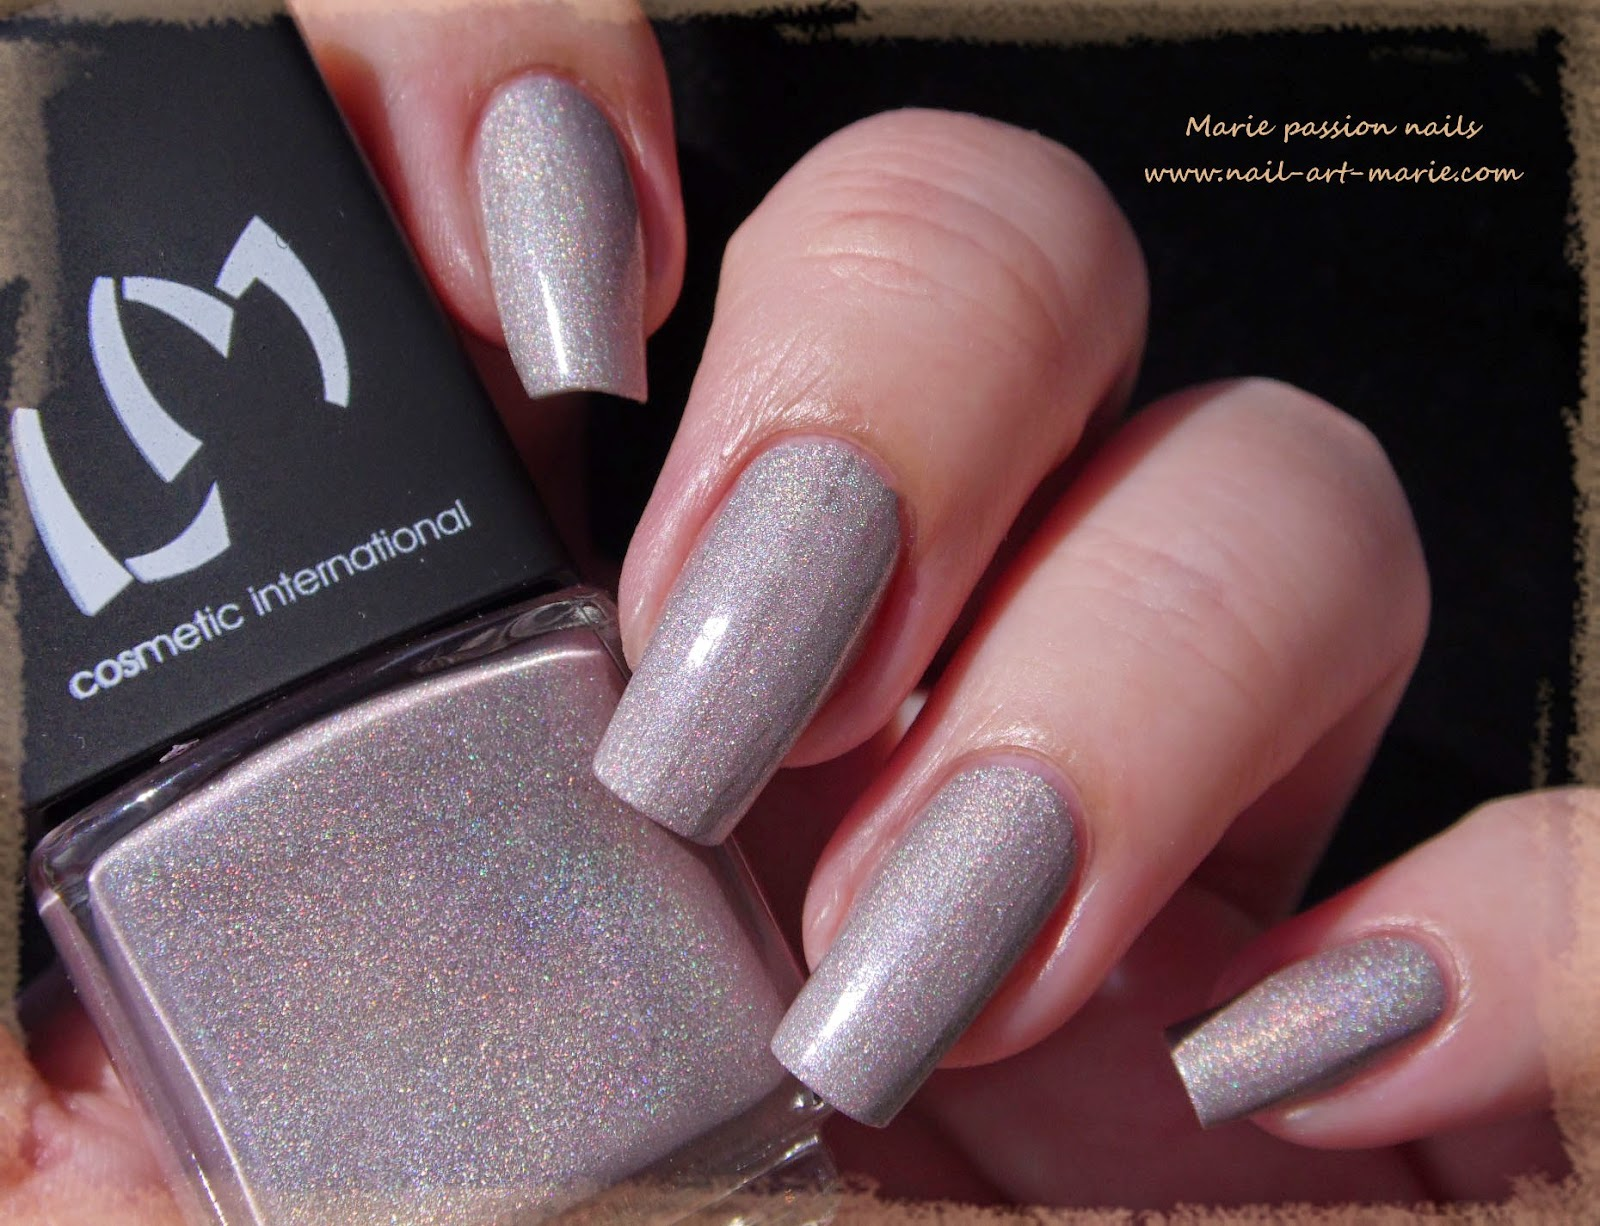 LM Cosmetic Révérence6